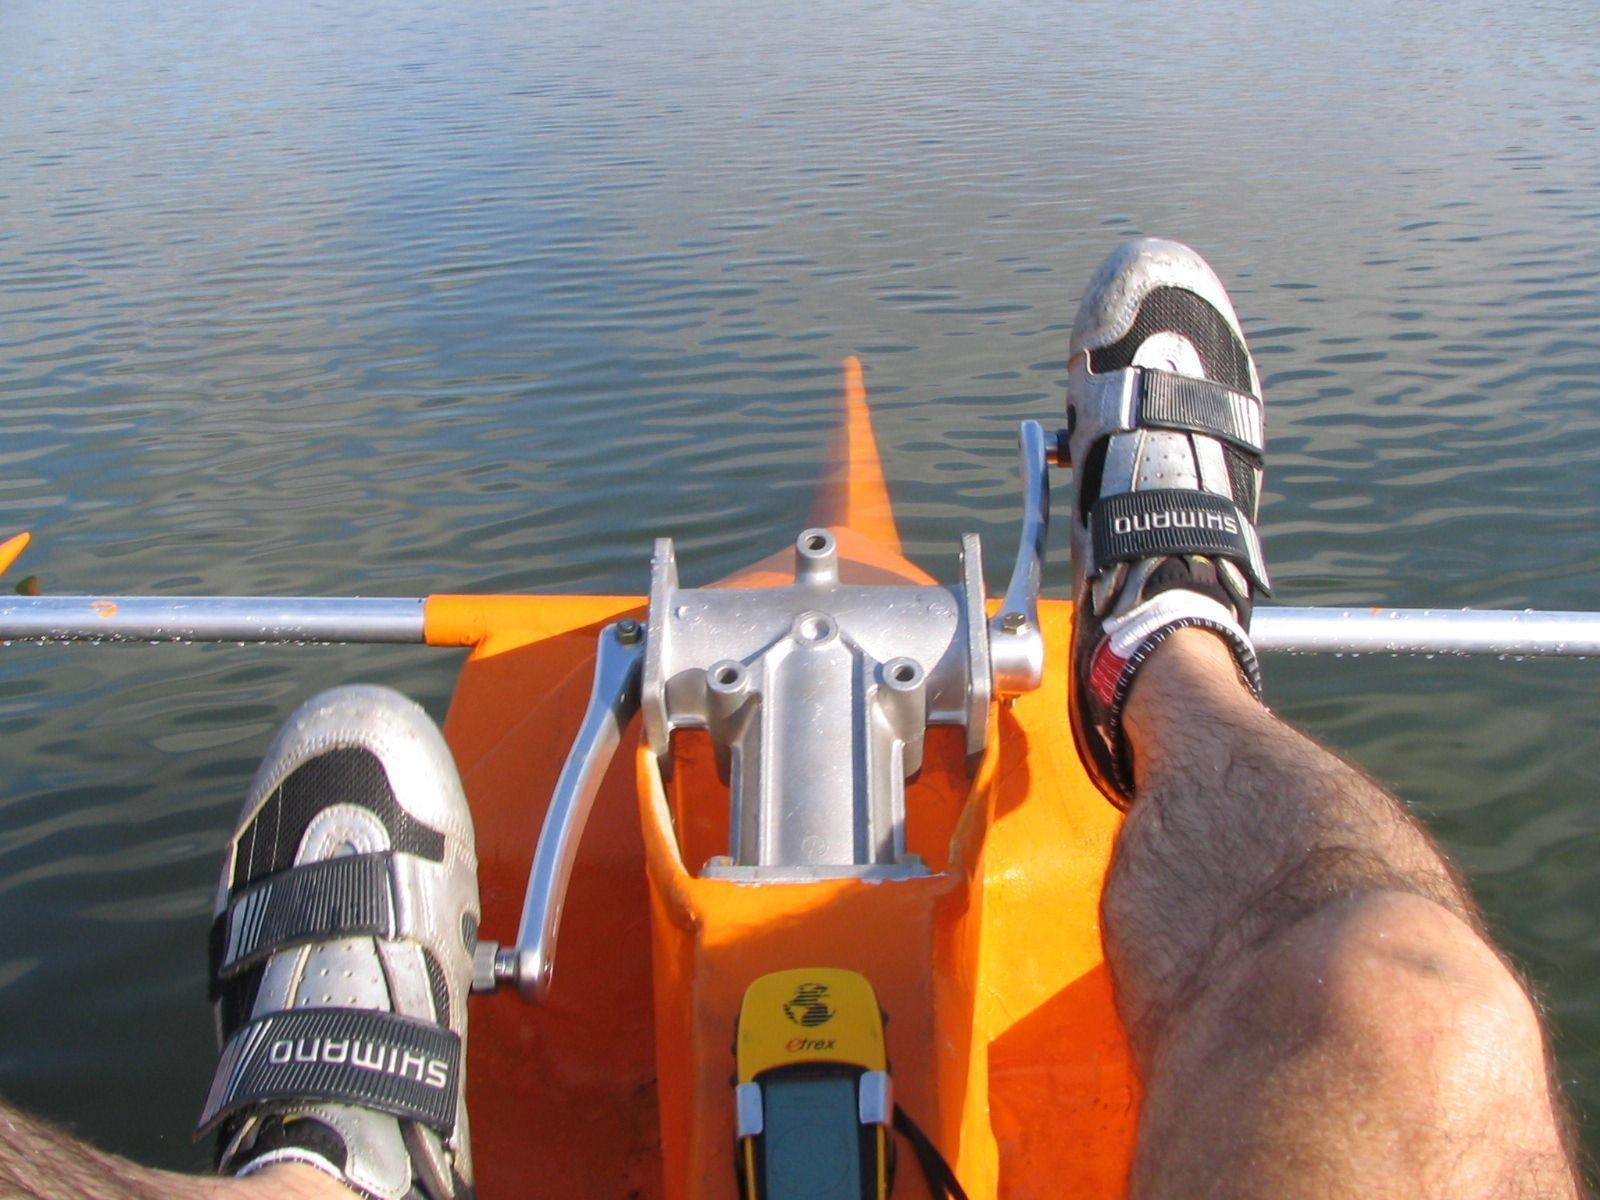 Diy Pedal Powered Kayak Cerca Con Google Pedal Powered Kayak Pedal Kayak Kayak Accessories